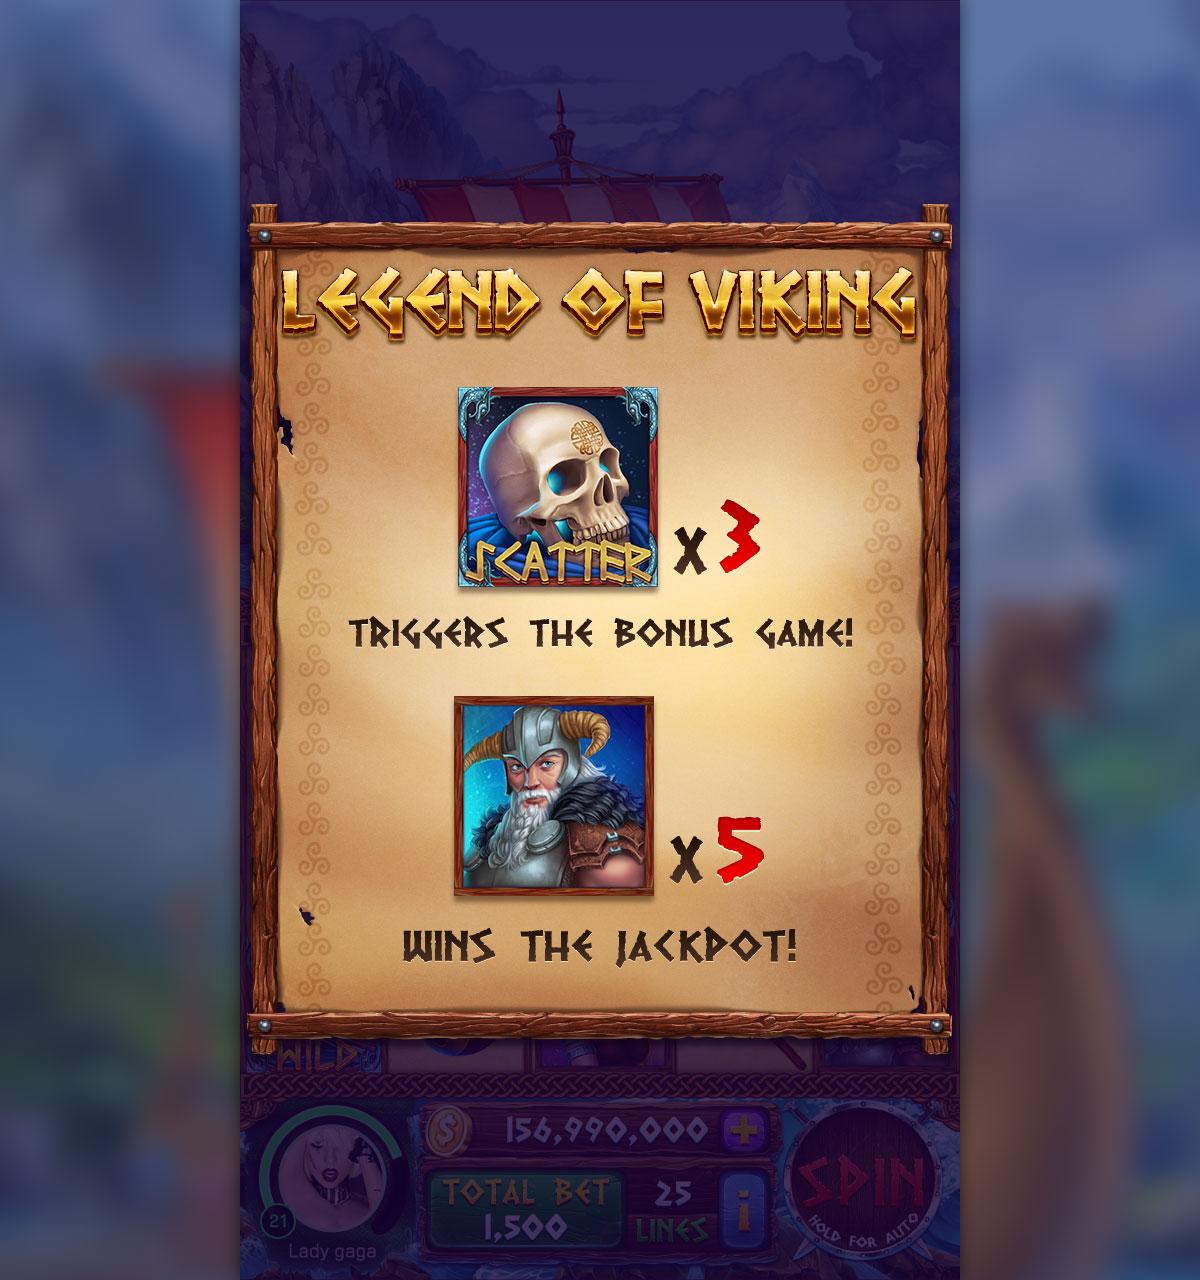 legend_of_viking_blog_info